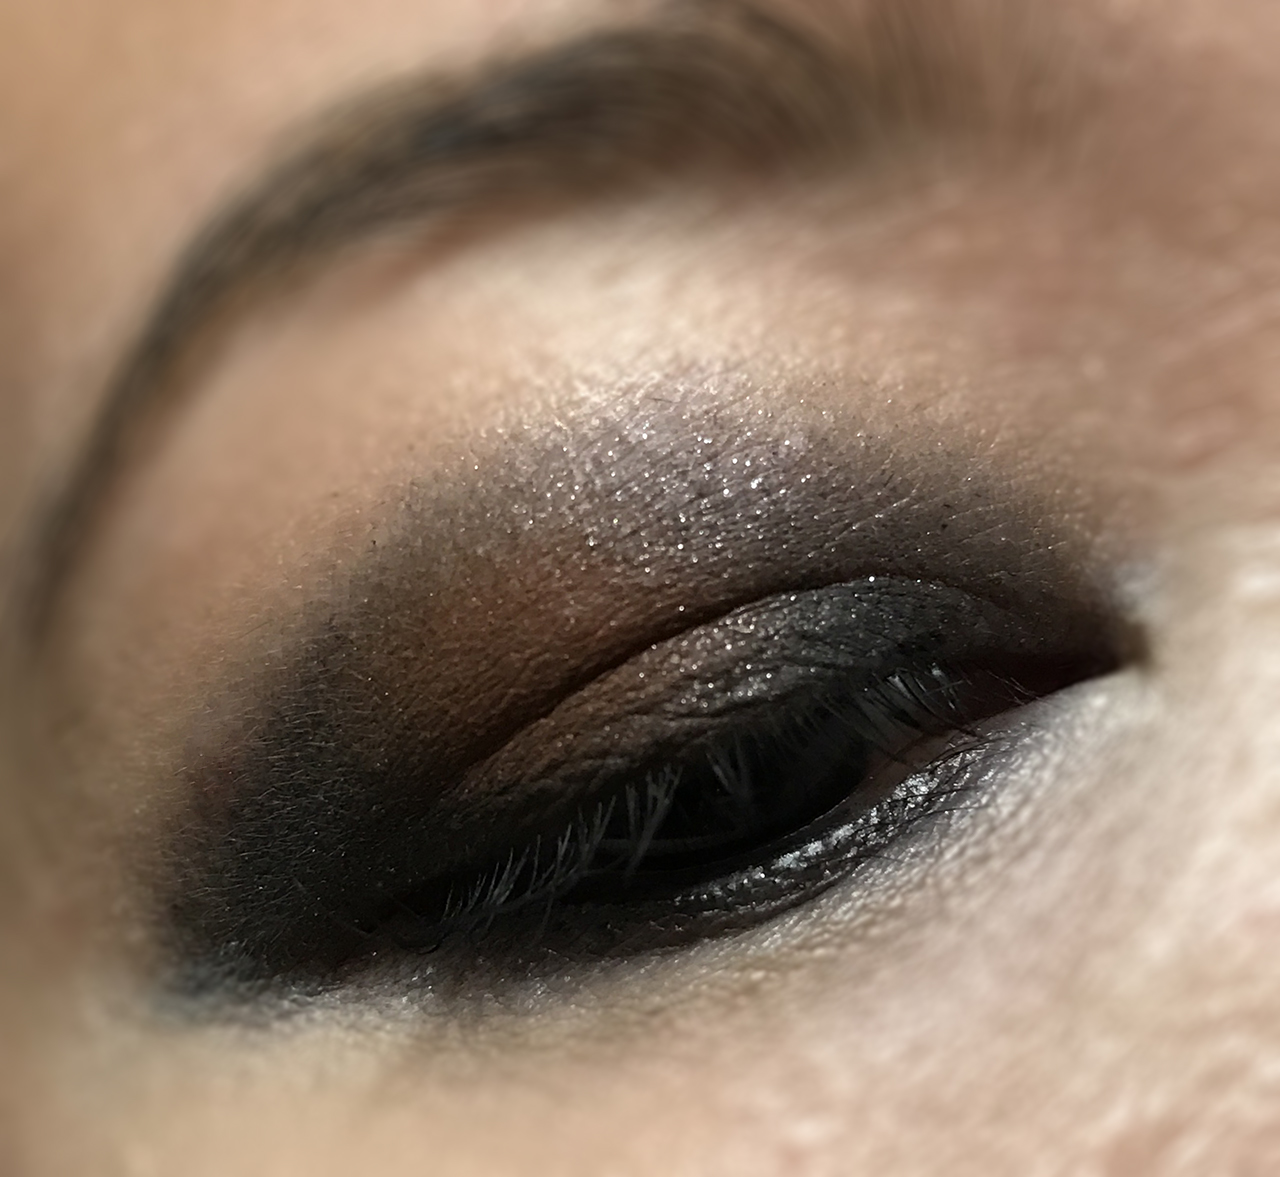 Victoria Beckham x Estee Lauder Saphir Orange Vif eye makeup look